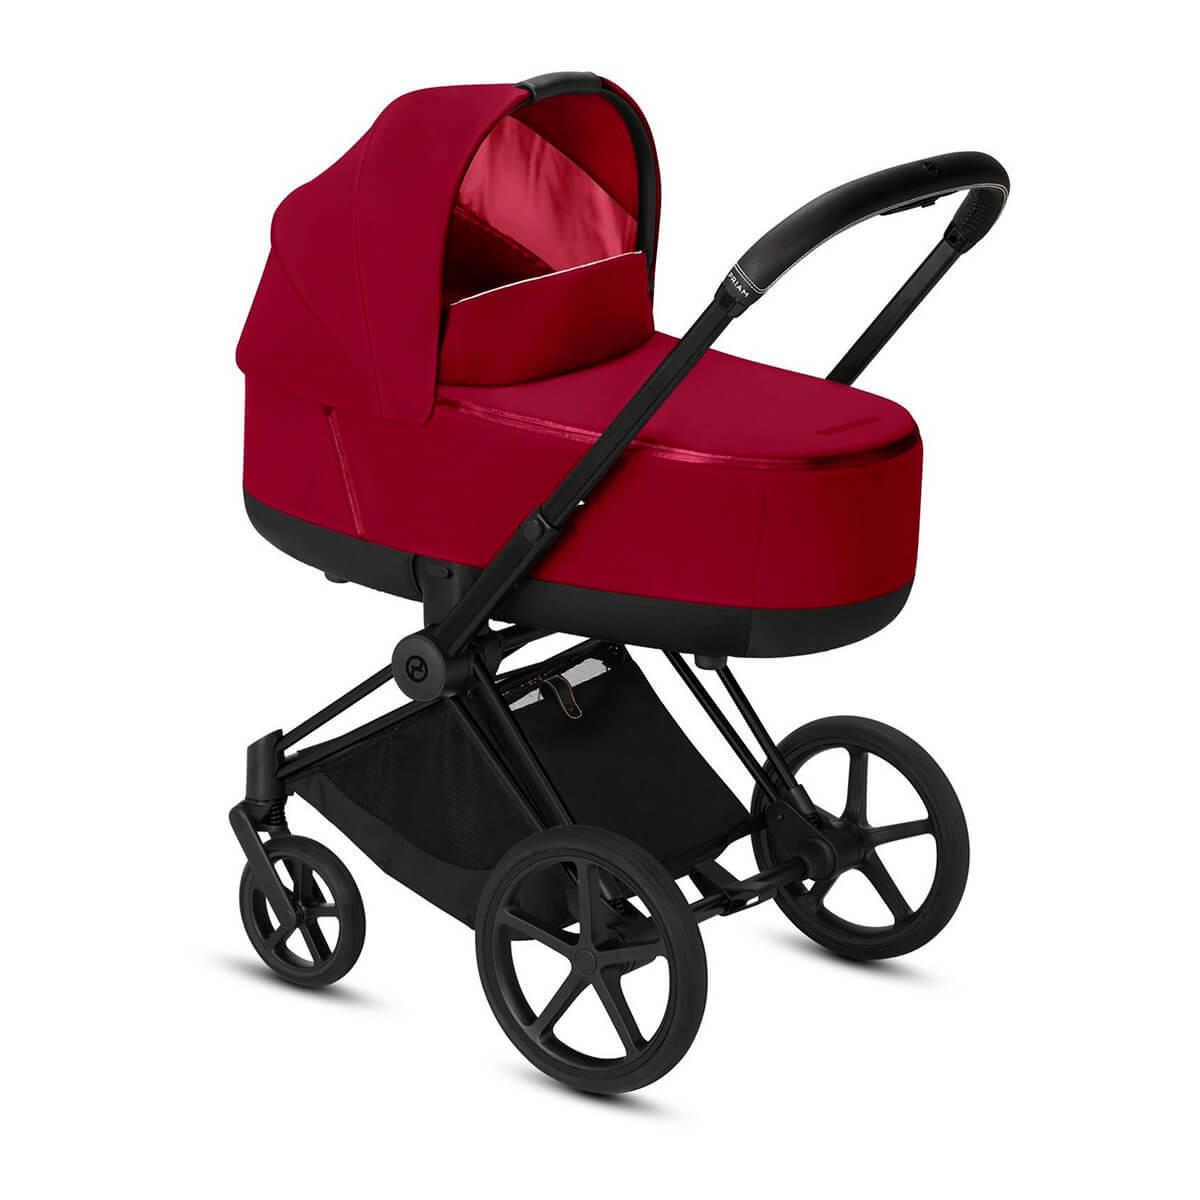 Цвета Cybex Priam для новорожденных Коляска для новорожденных Cybex Priam III True Red на шасси Matt Black cybex-priam-iii-true-red-frame-matt-black.jpg